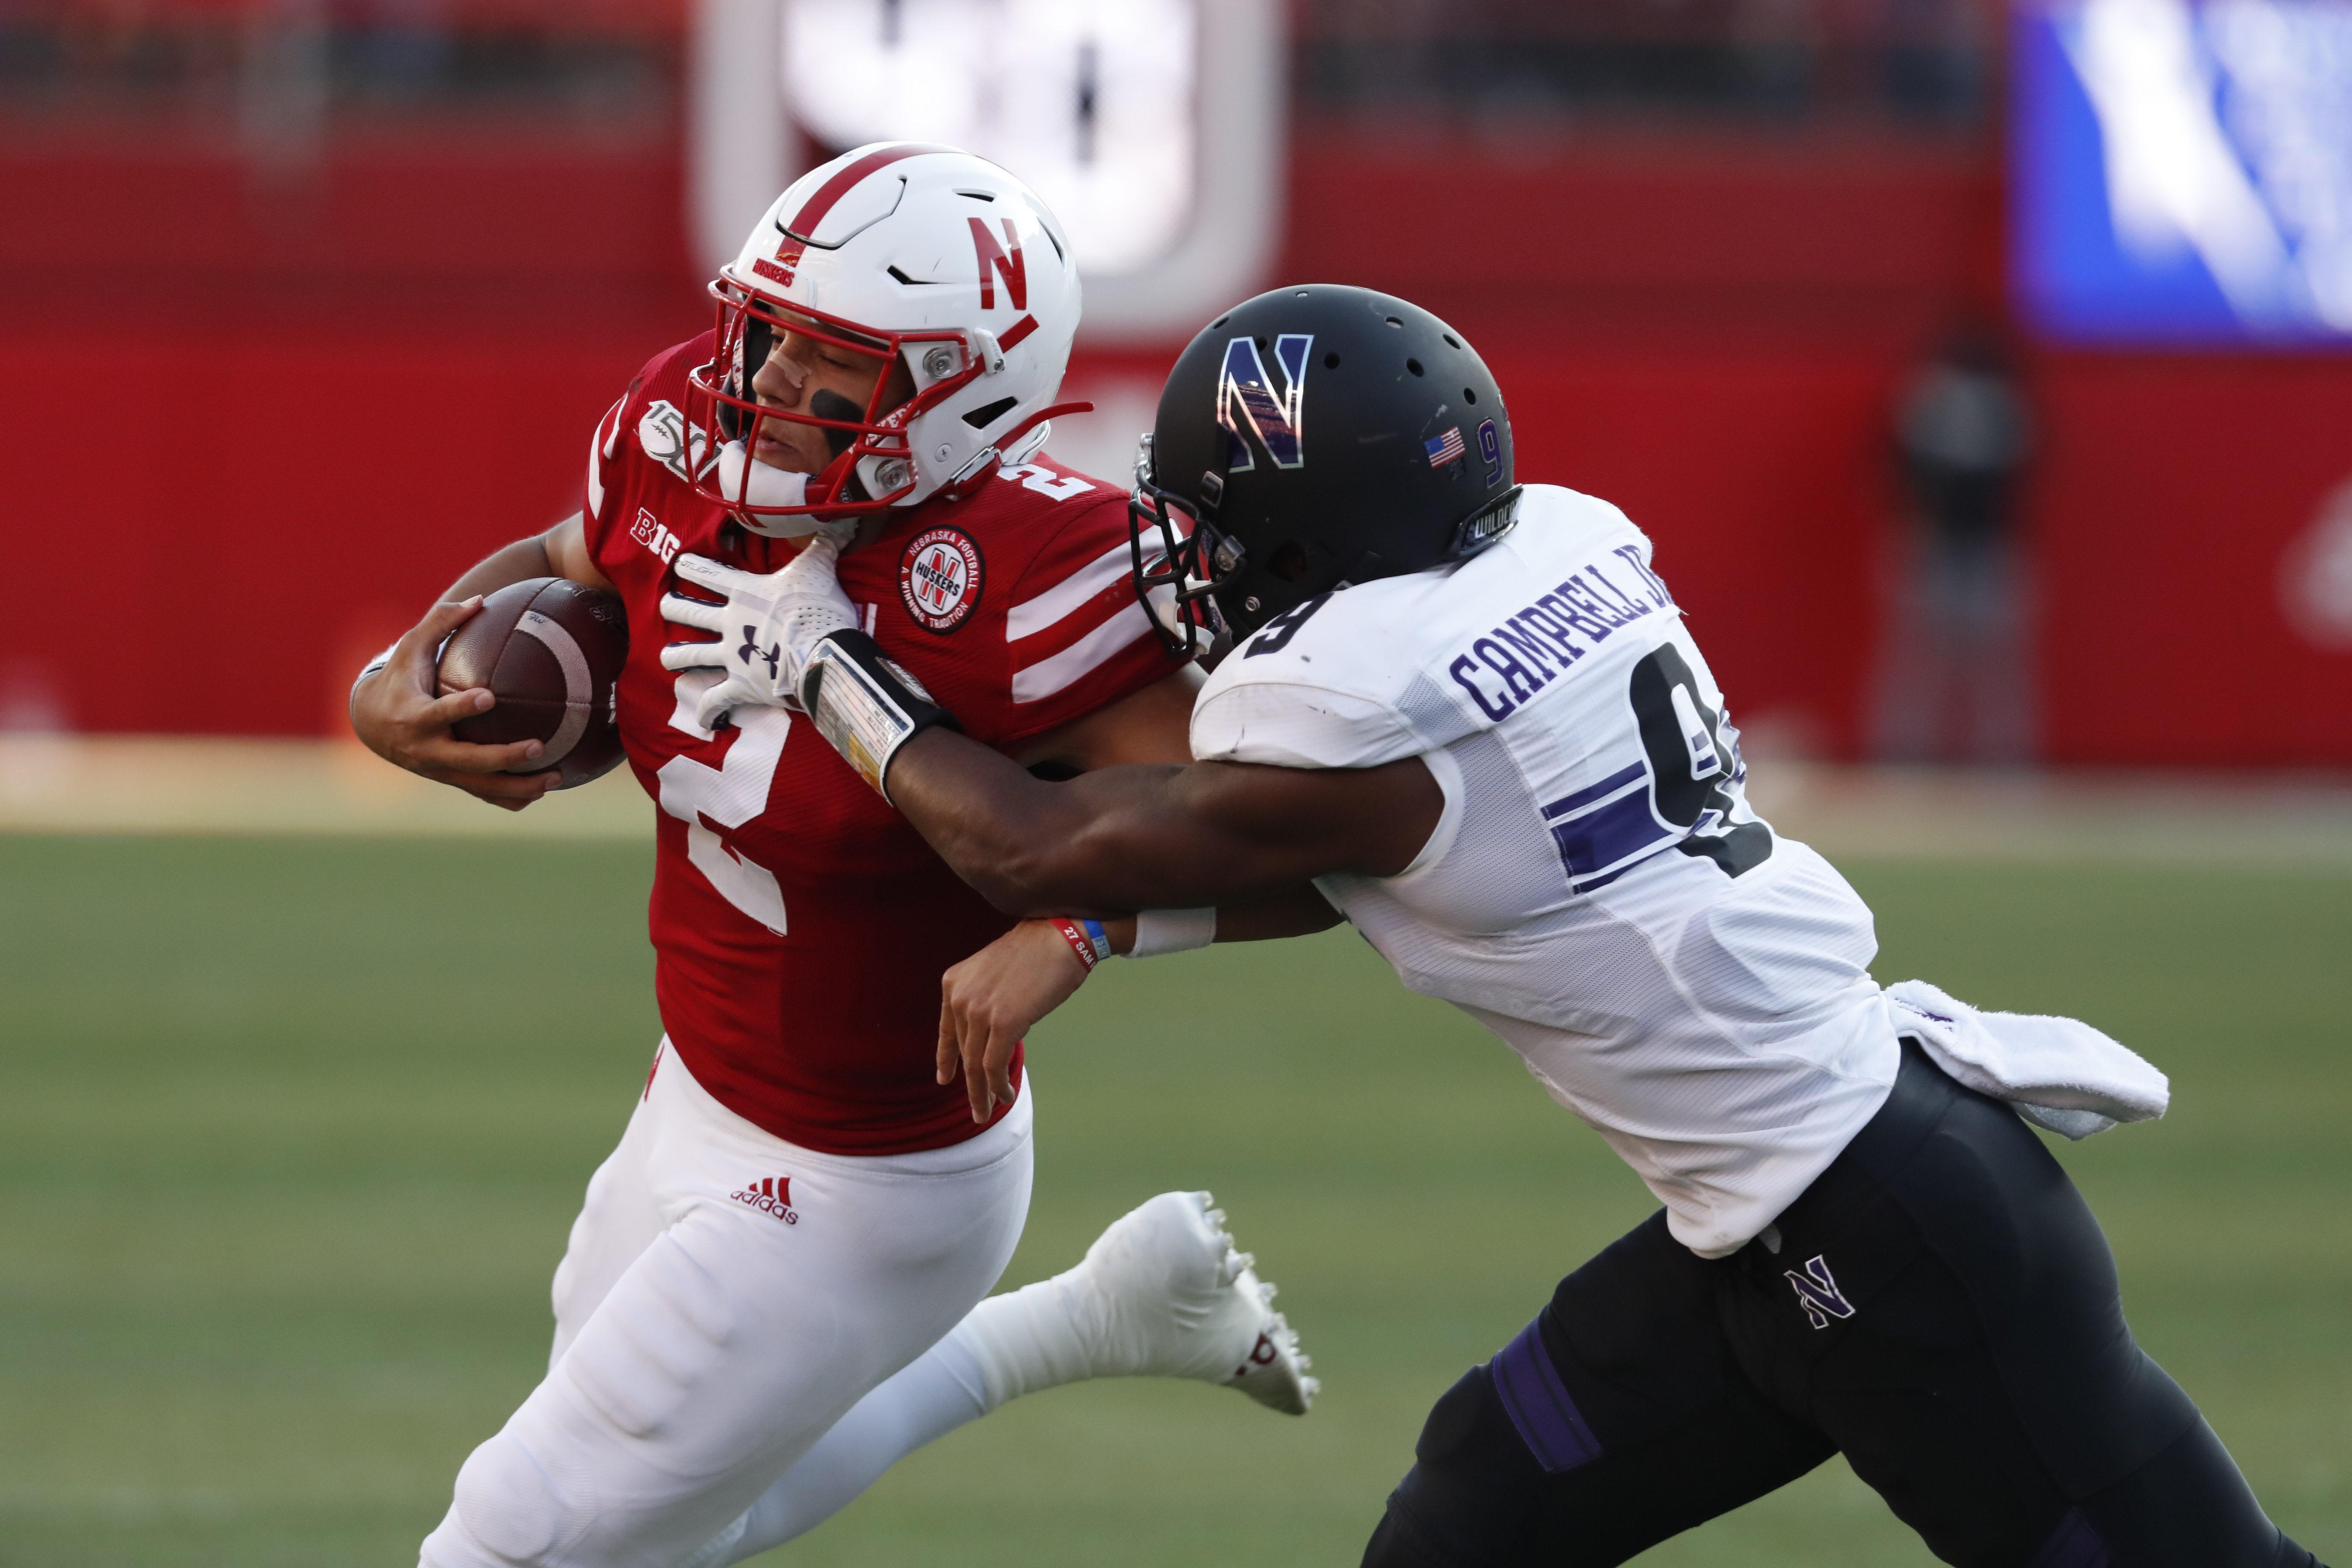 NCAA Football: Northwestern at Nebraska